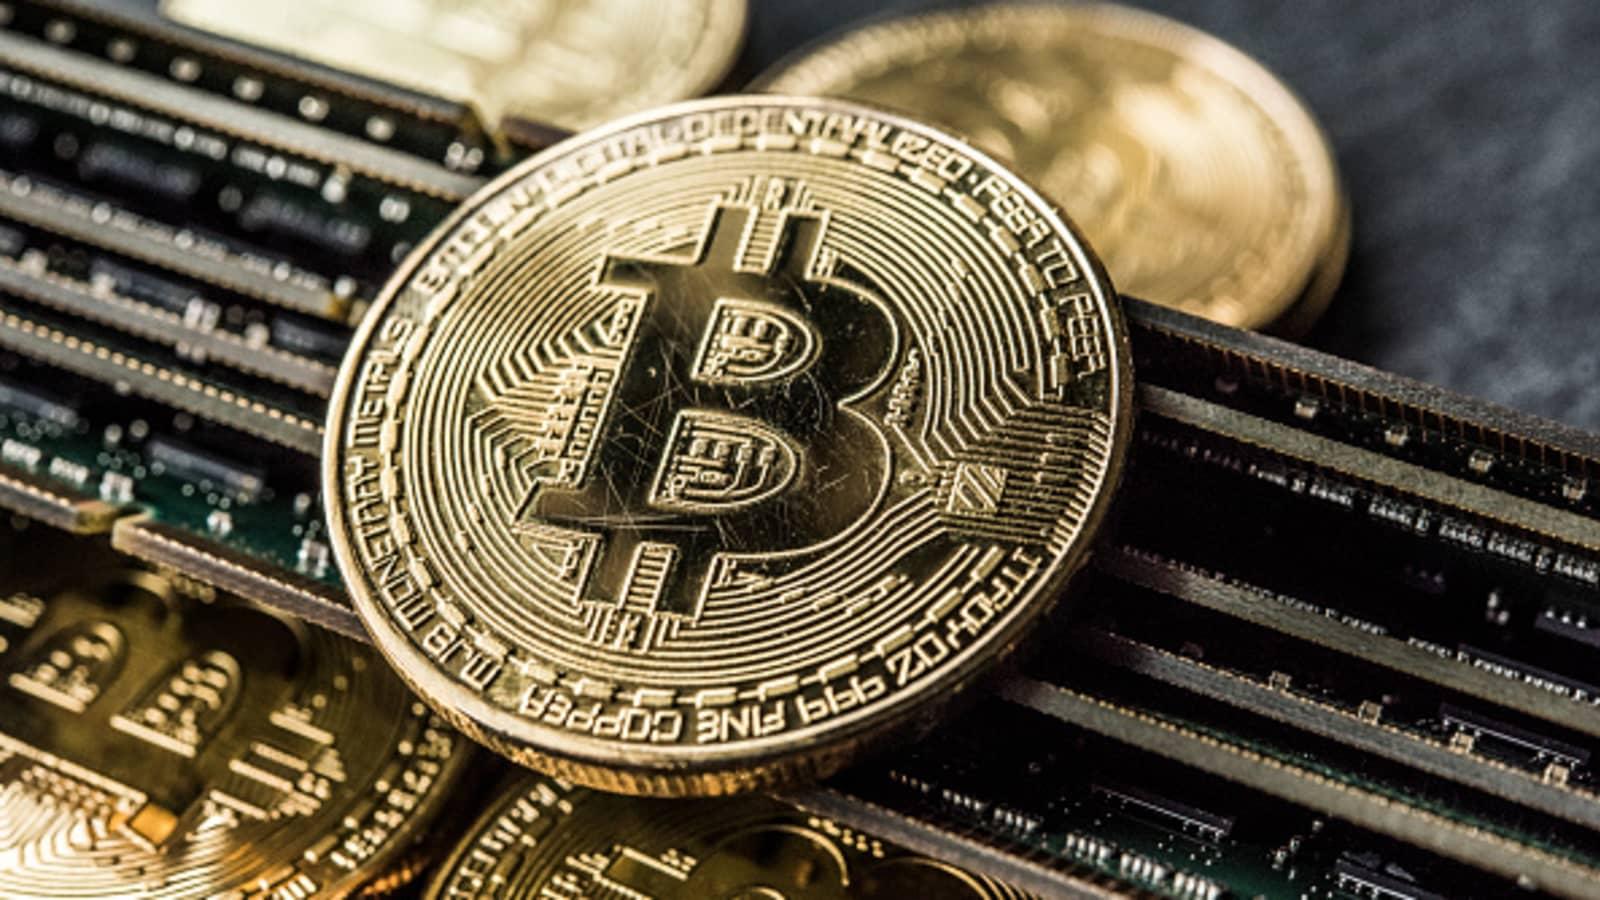 prezzo criptovaluta token